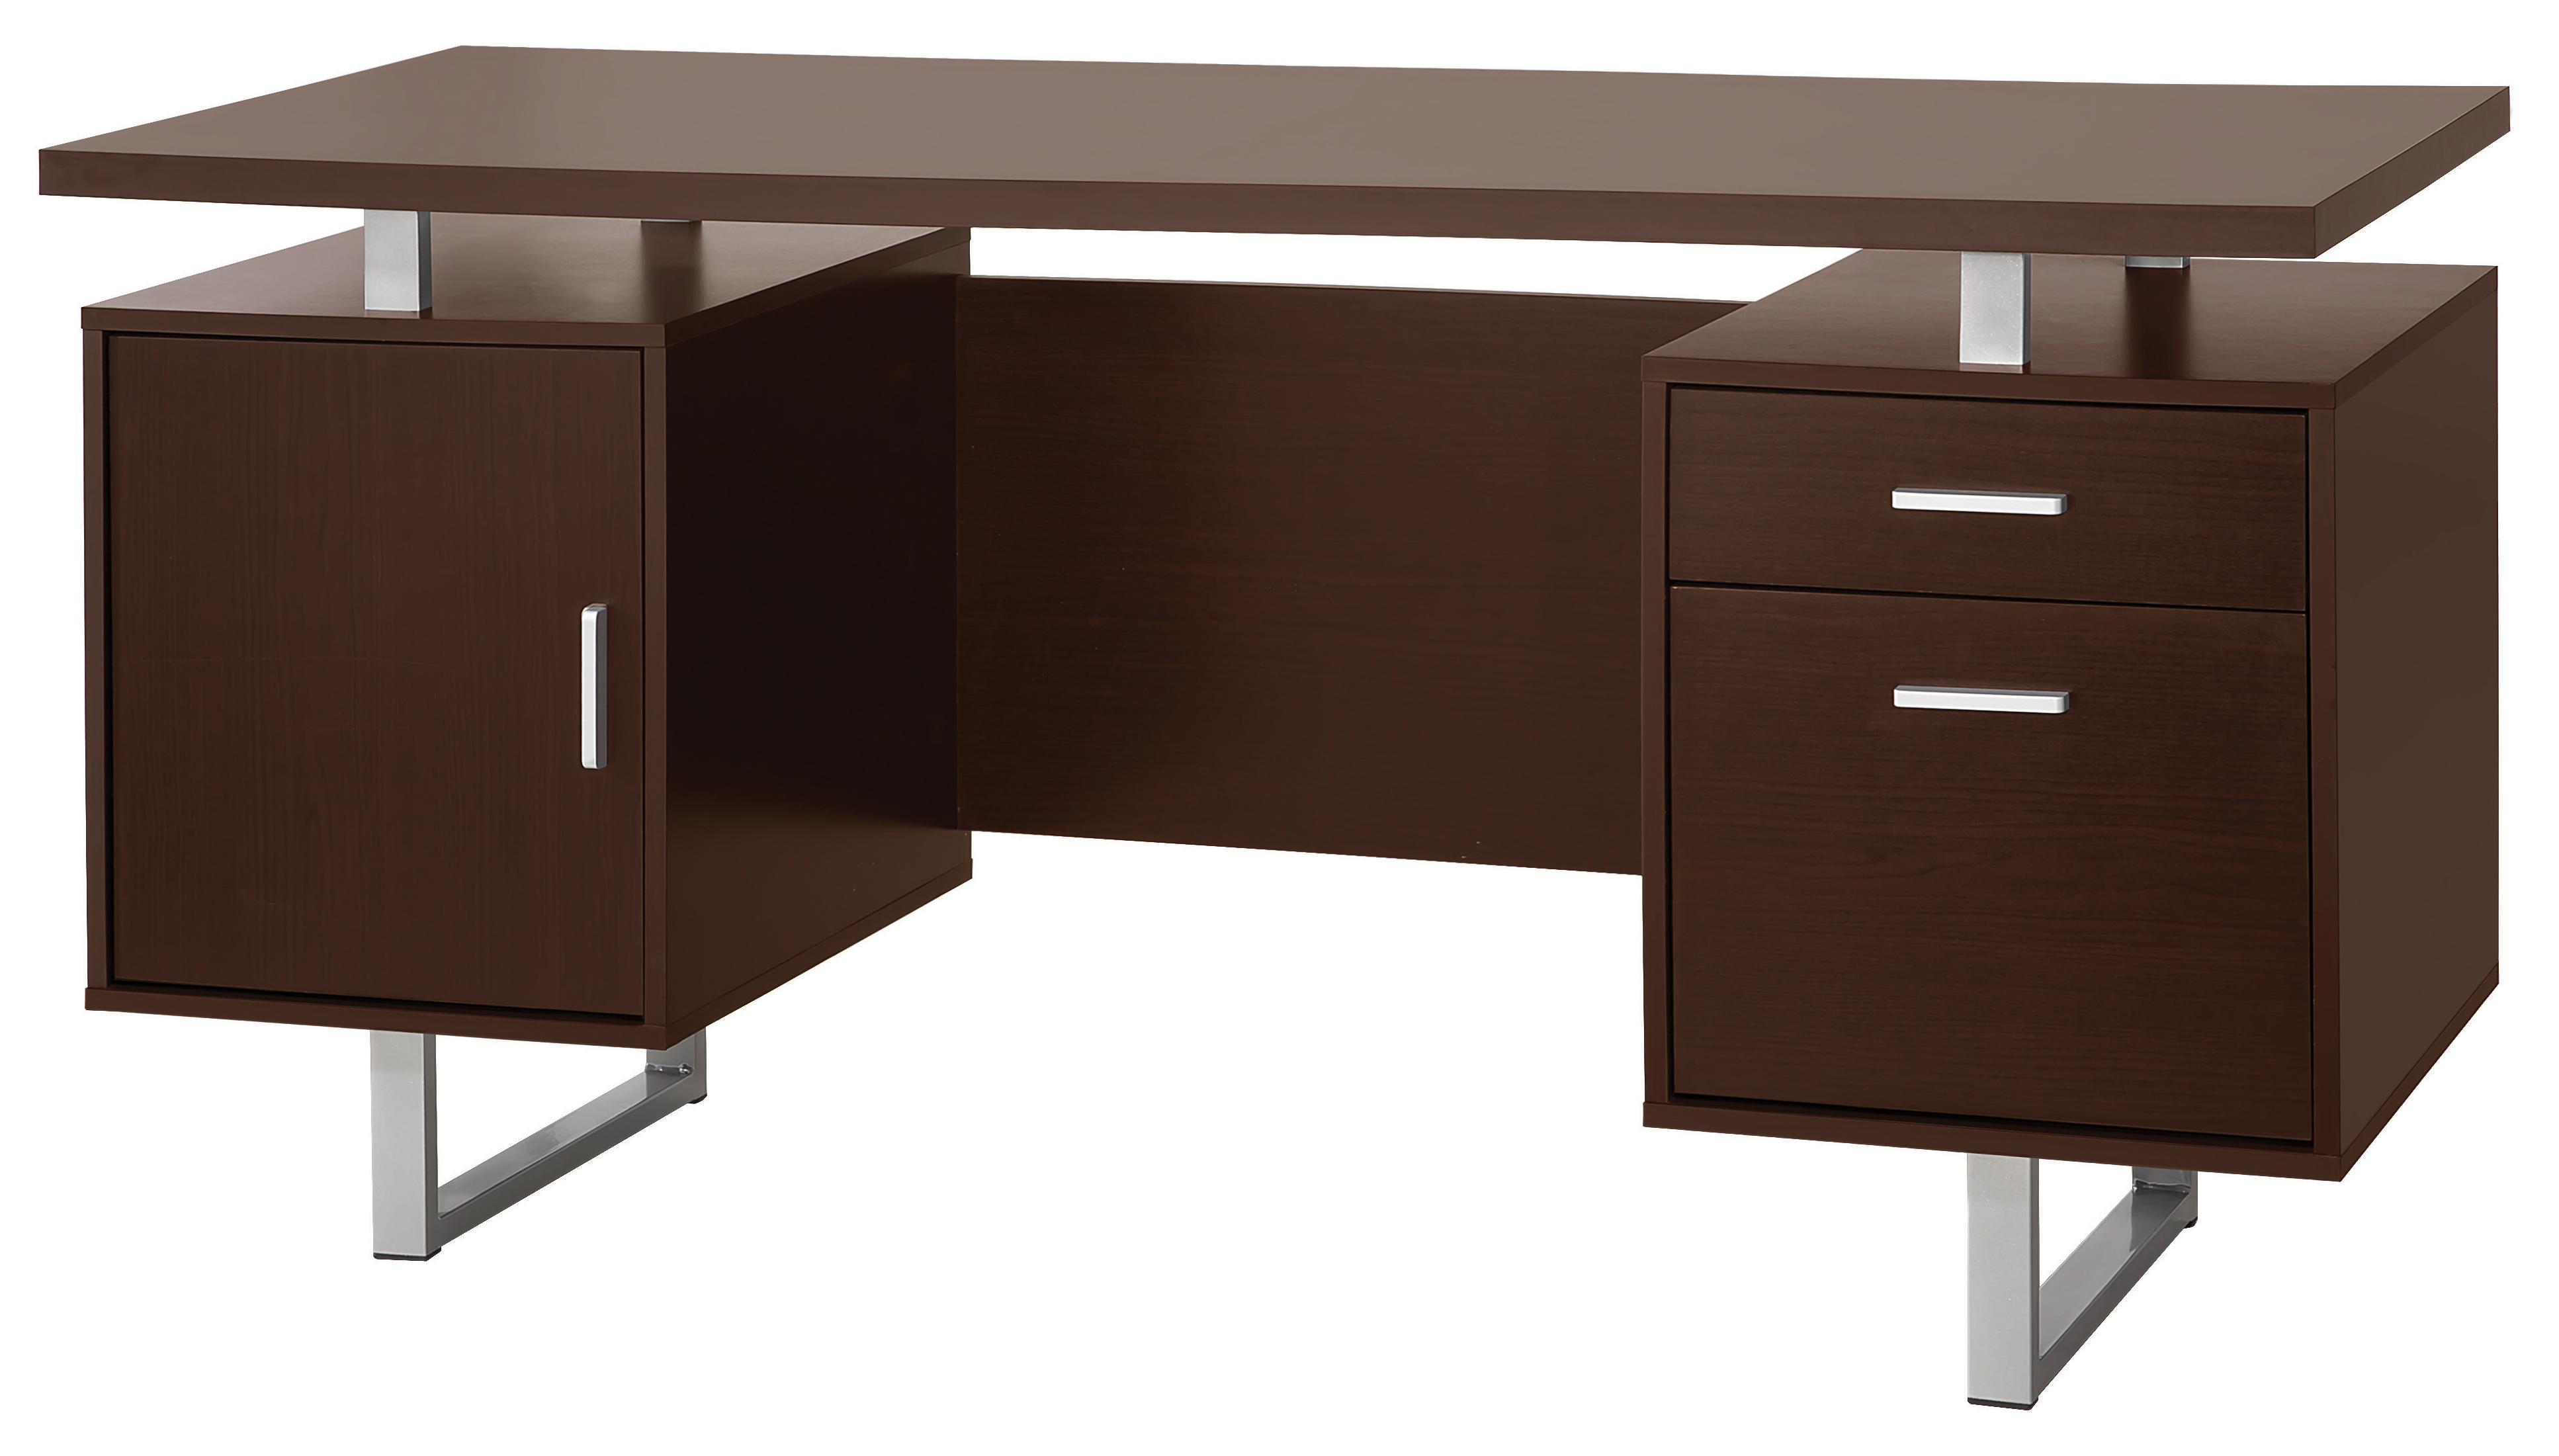 Glavan Contemporary Double Pedestal Office Desk with Metal